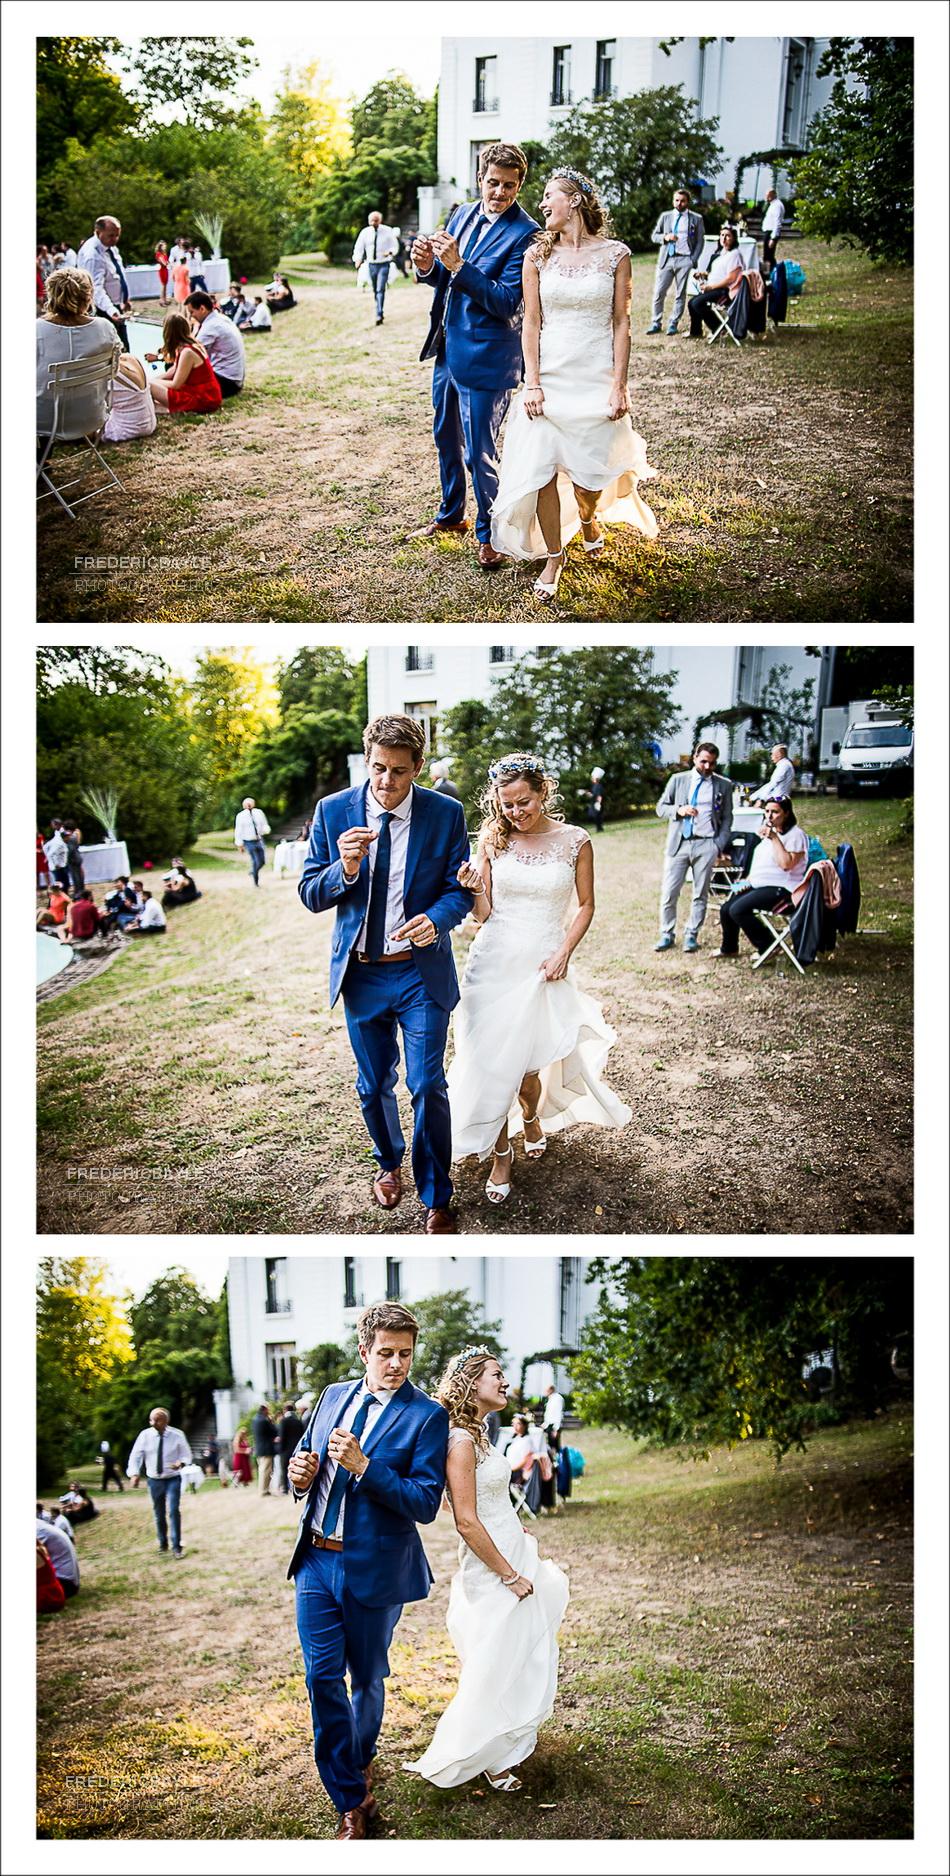 mariage-maison-blanche-etienne-brunel-52